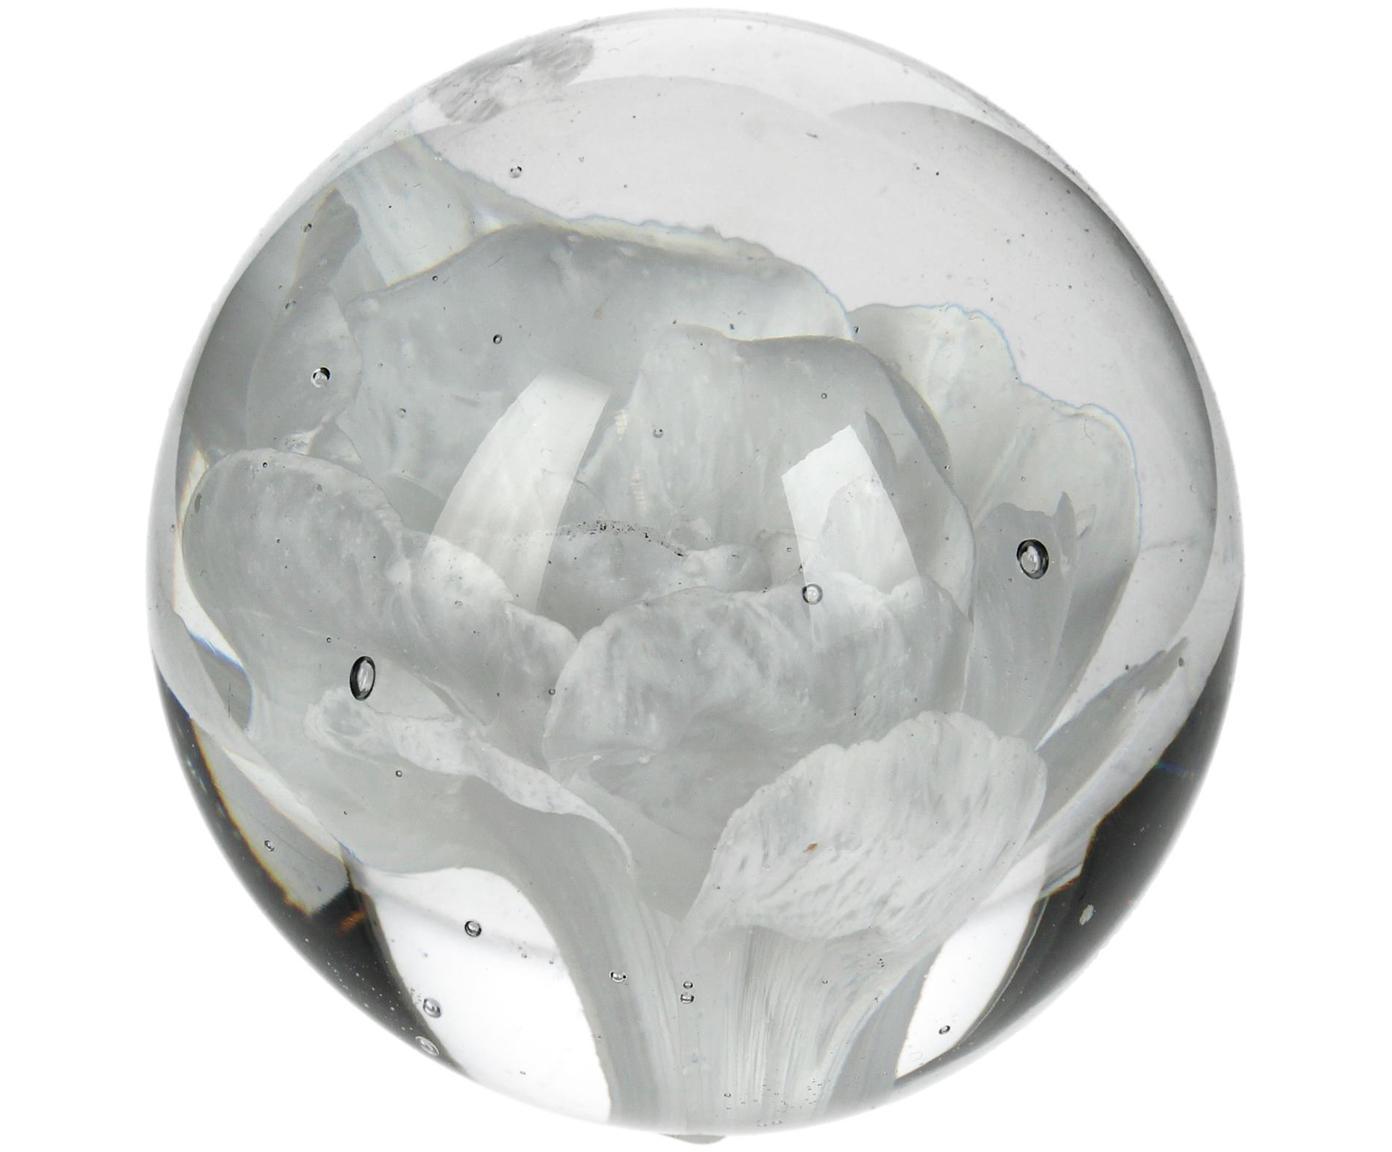 Presse-papier Flower, Glas, Wit, Ø 7 x H 7 cm